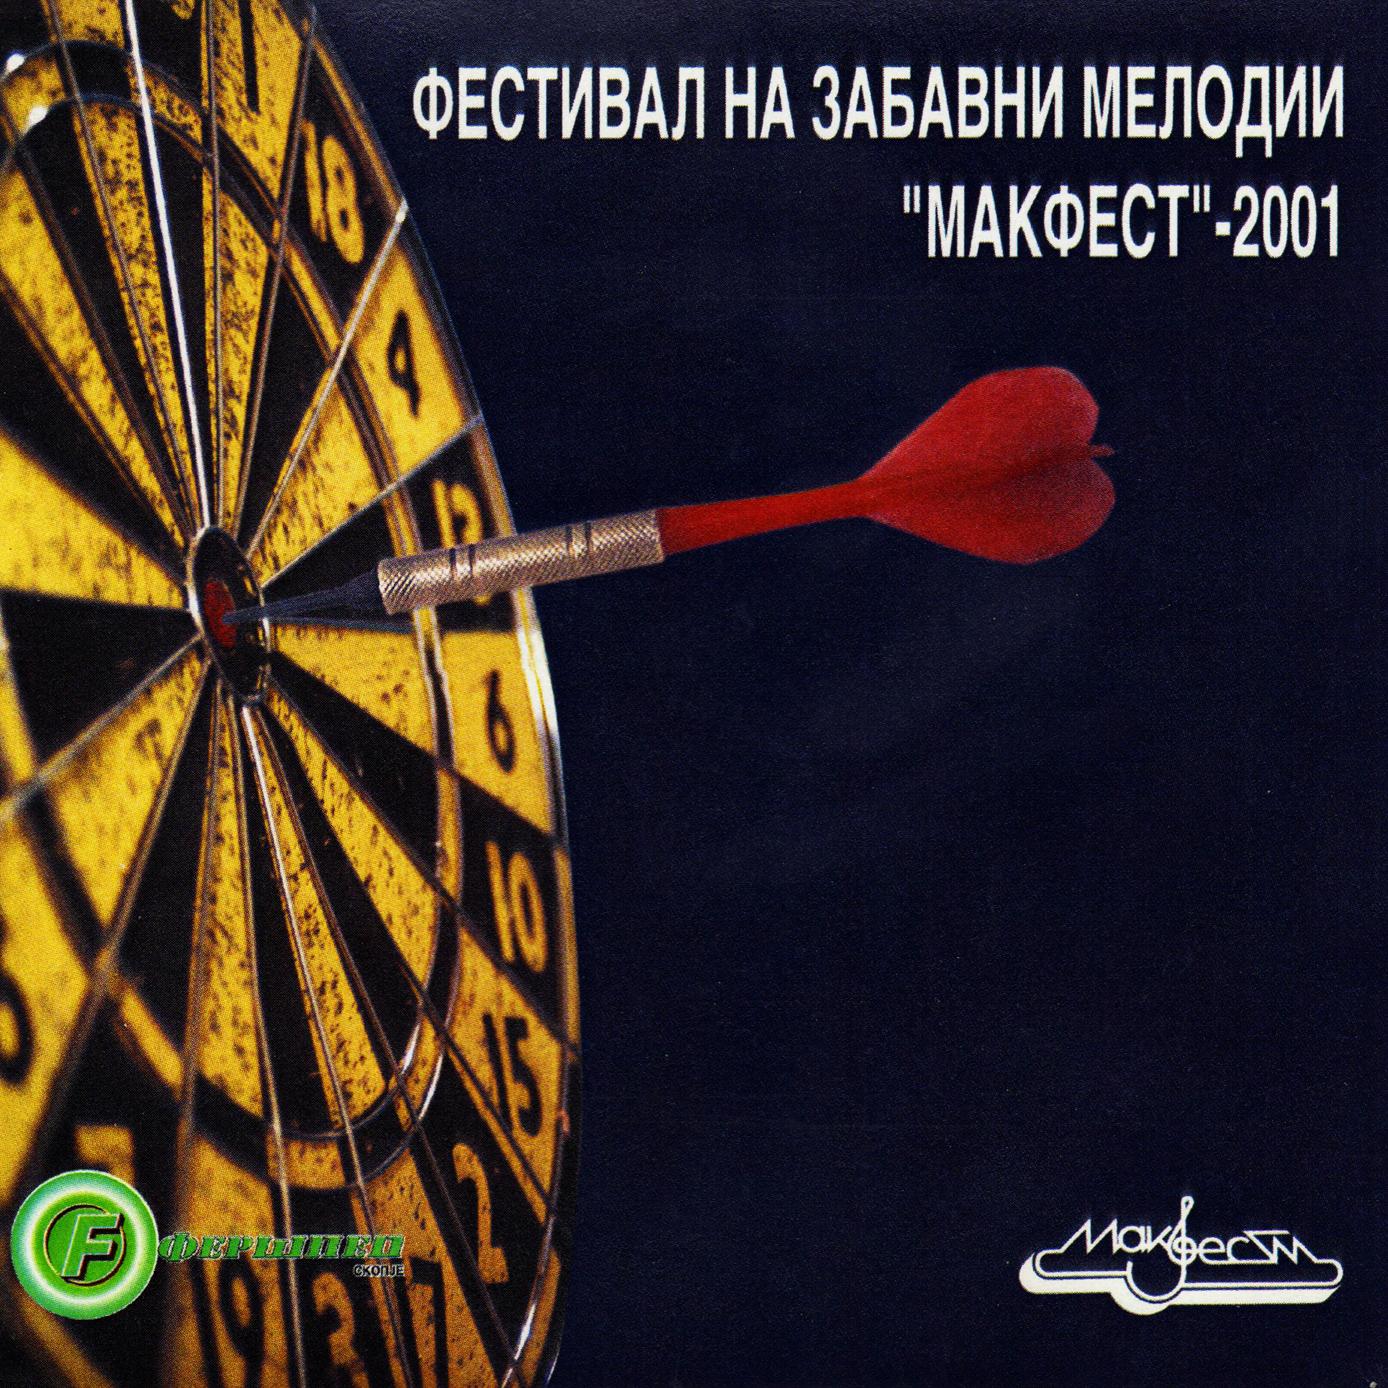 MAKFEST 2001